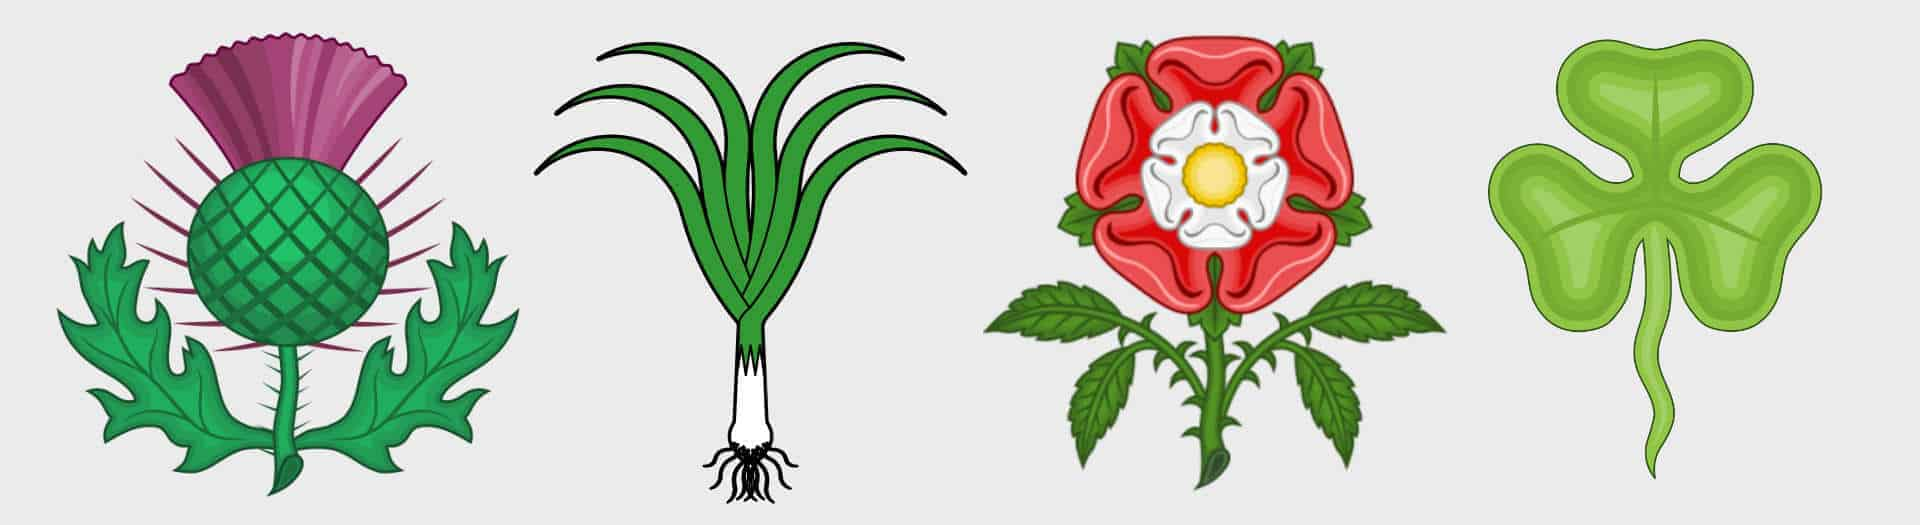 1920 National symbols header 1 - British National Symbols